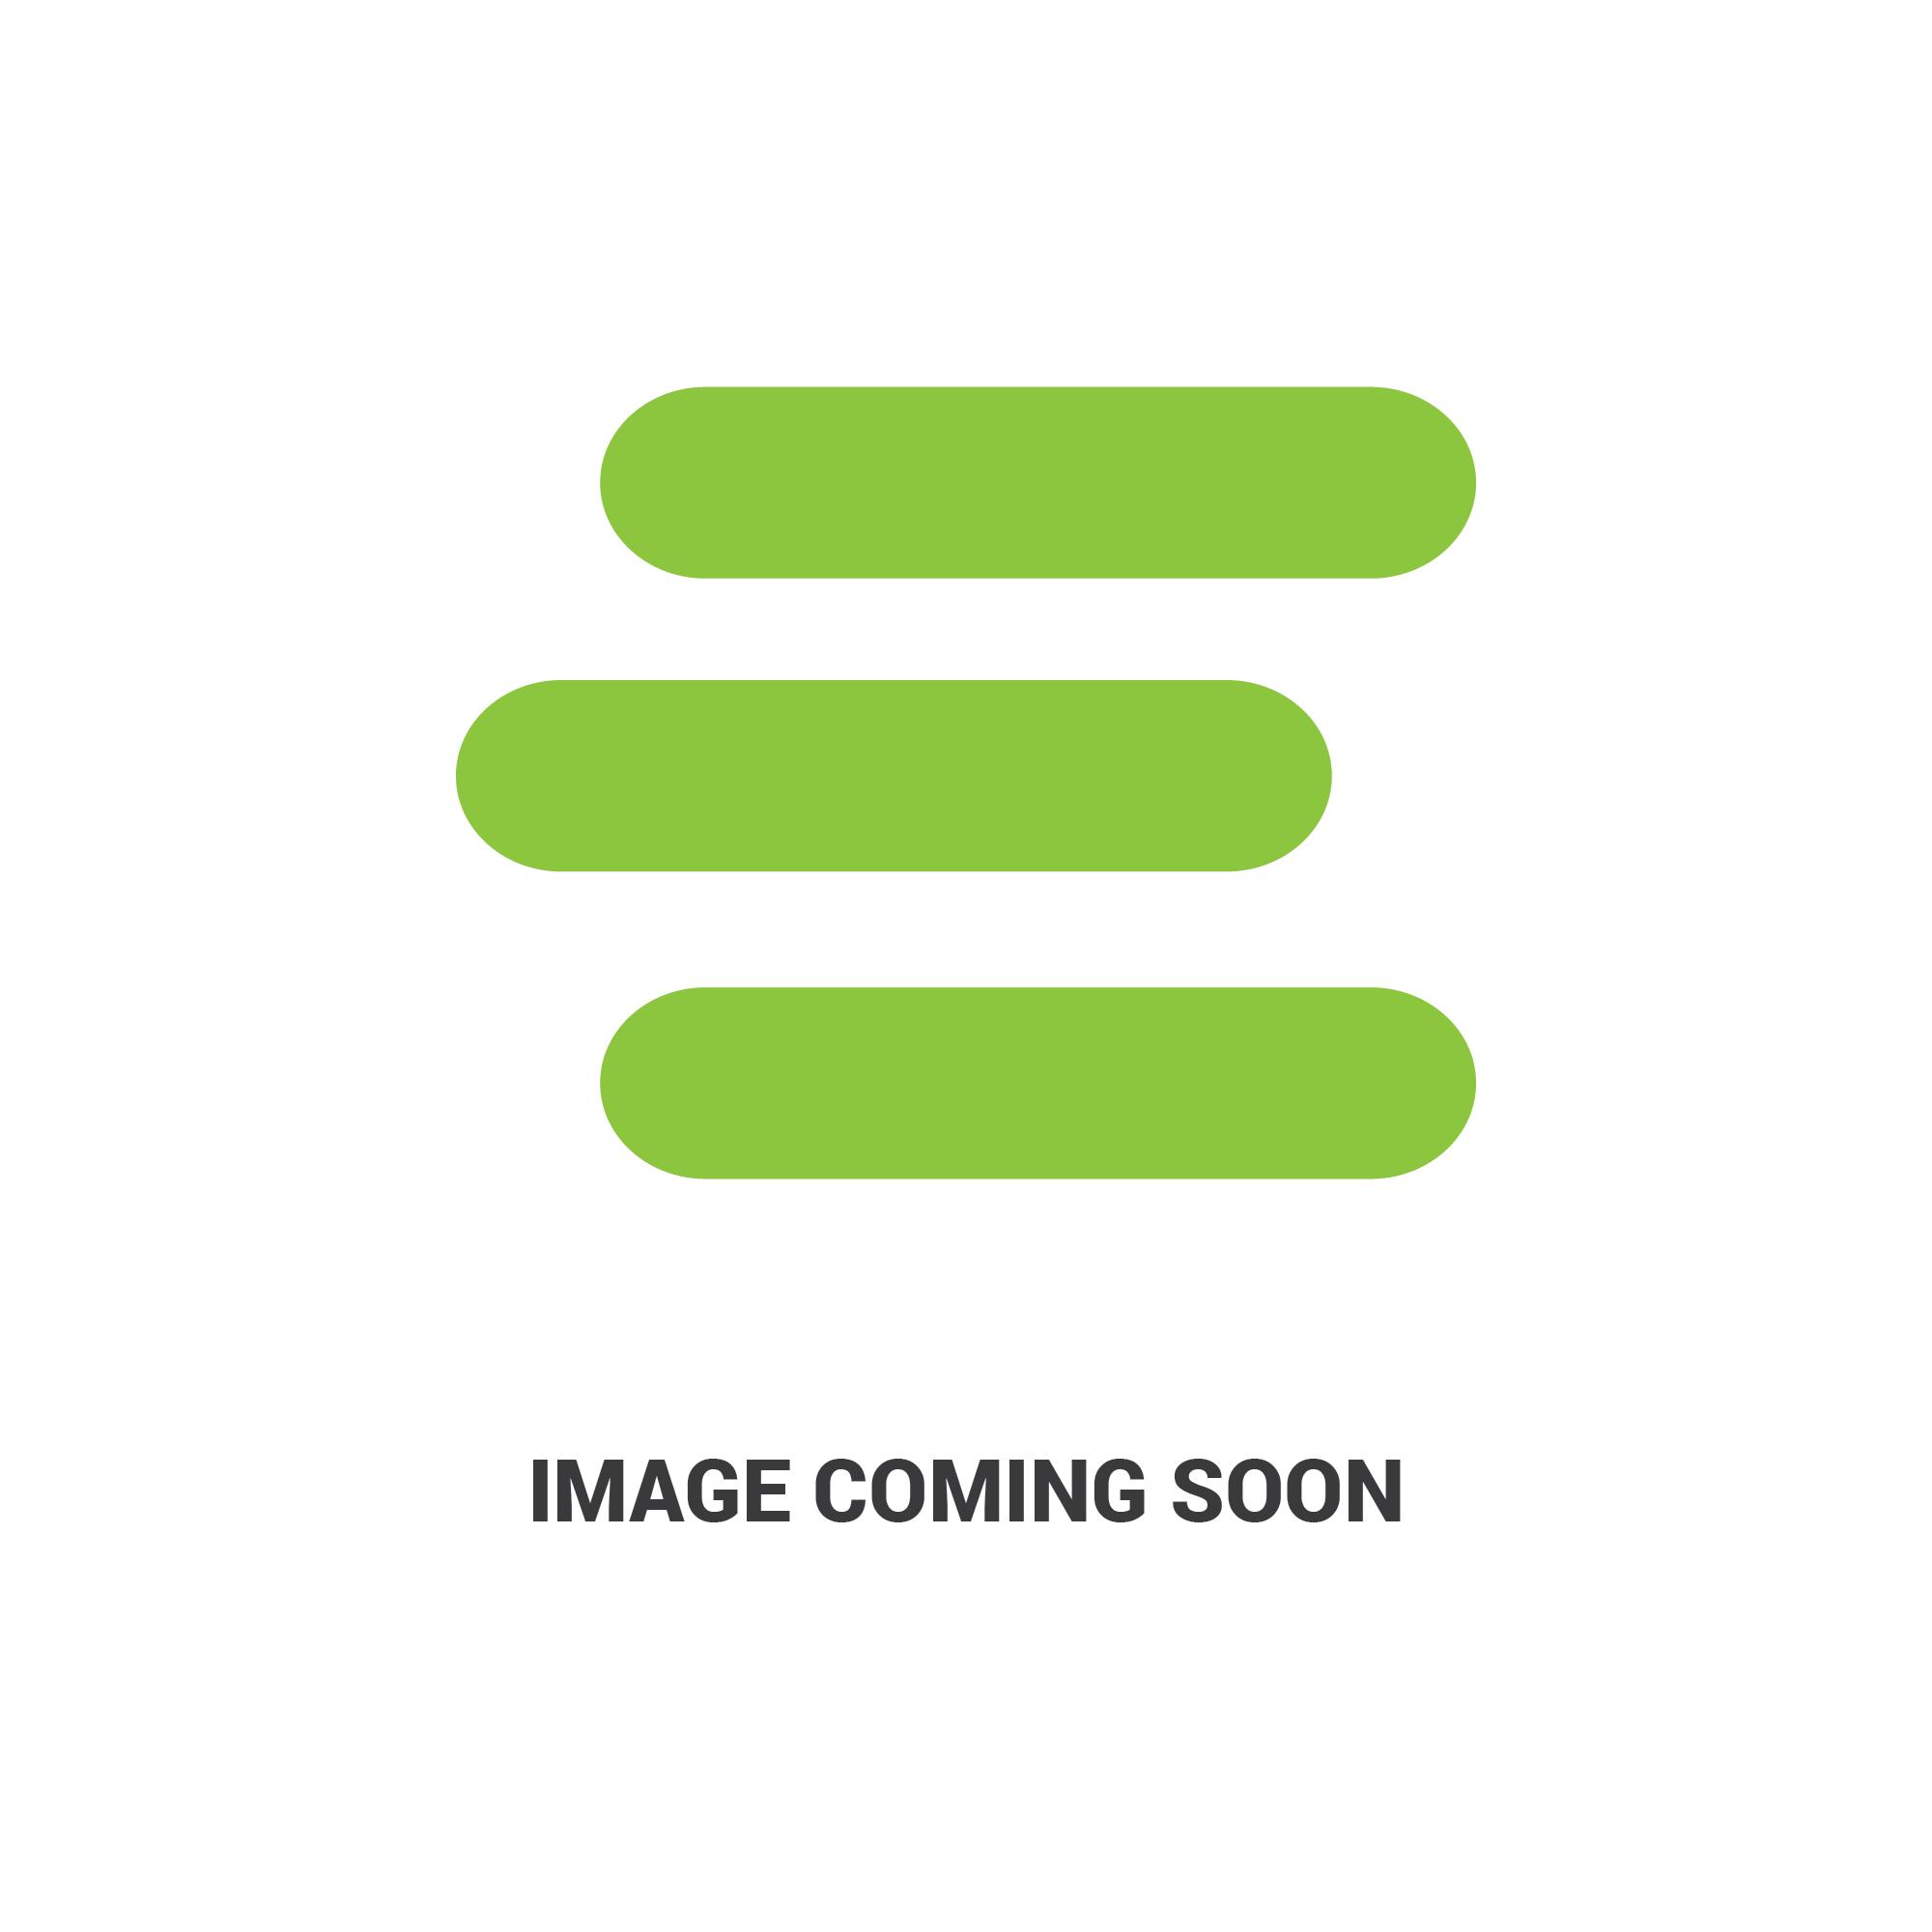 E-70034451226_1.jpg